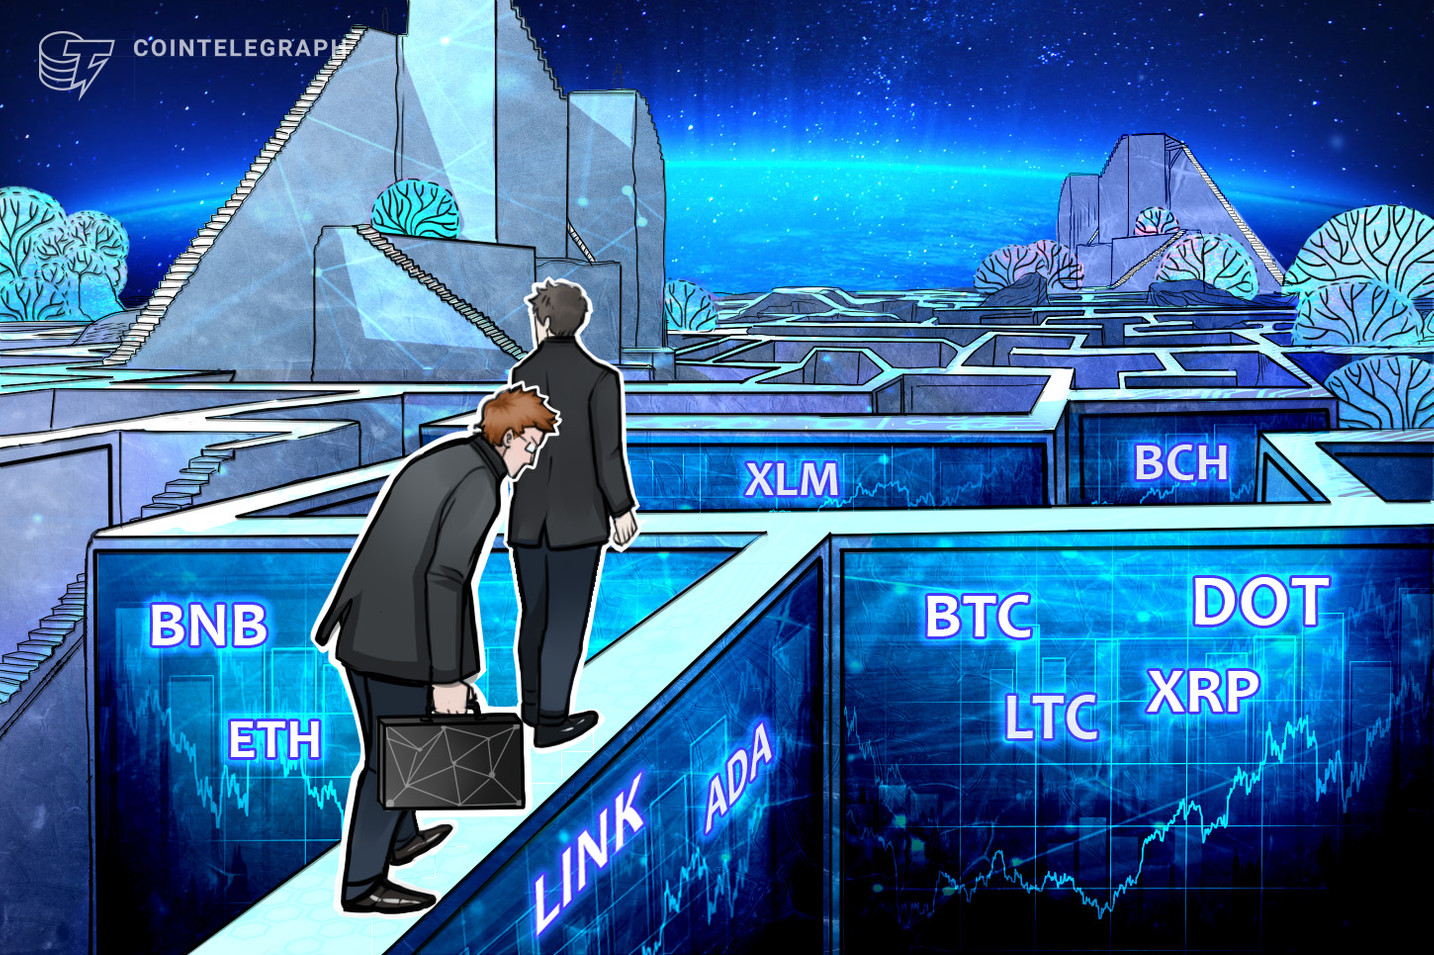 Análisis de precios al 26/2: BTC, ETH, ADA, BNB, DOT, XRP, LTC, LINK, BCH, XLM